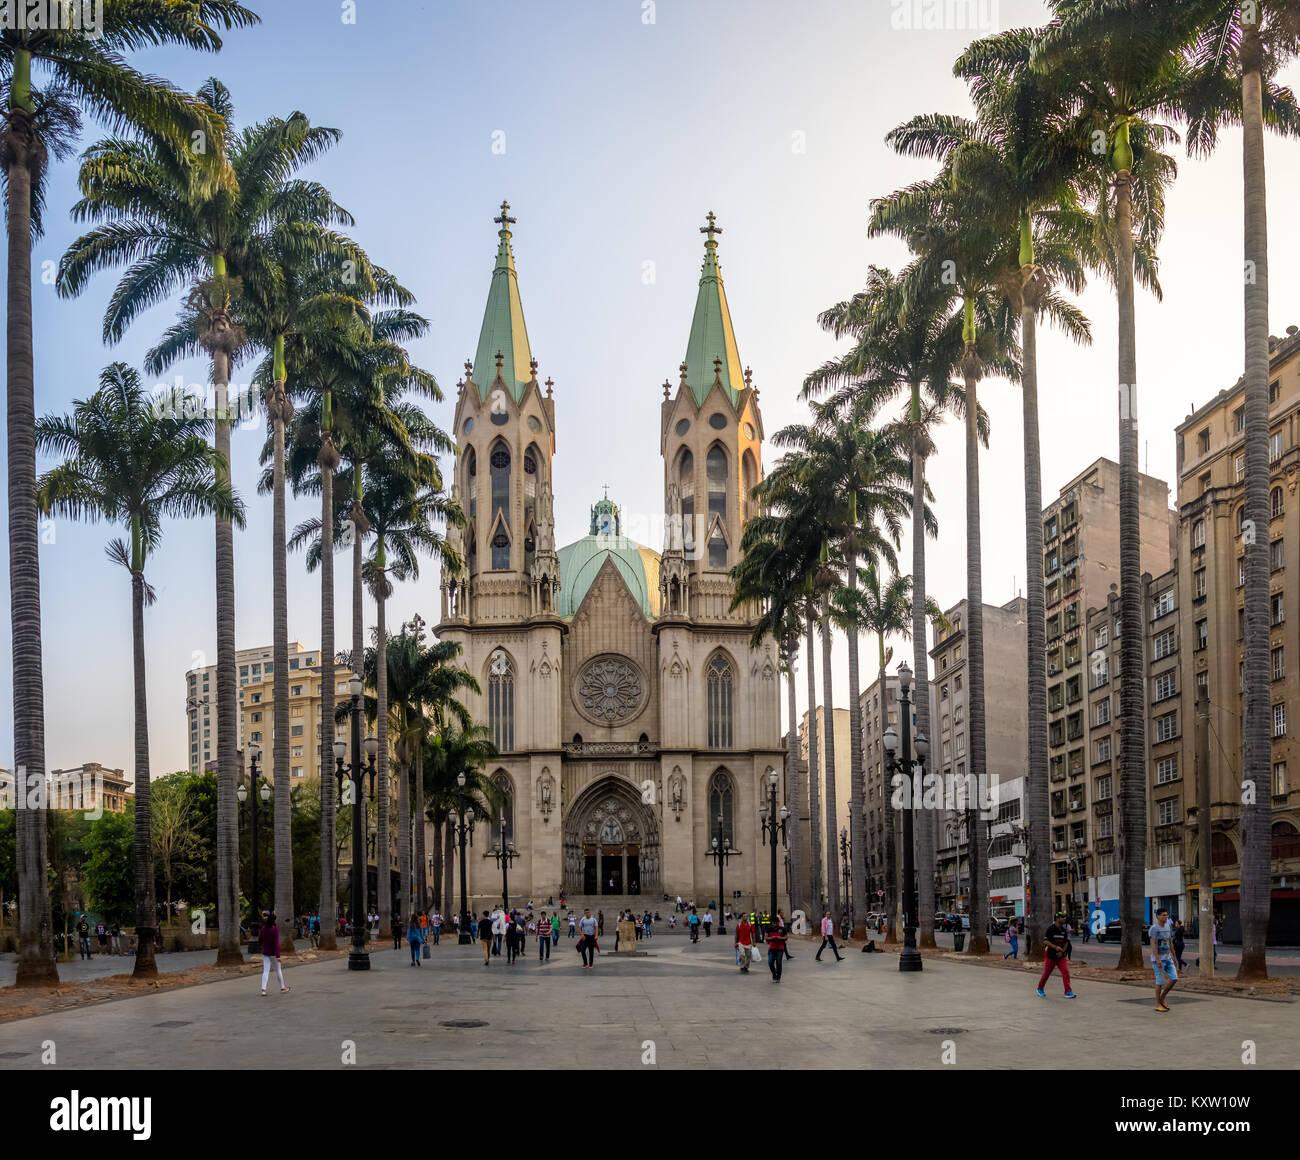 Cathédrale Se - São Paulo, Brésil Photo Stock